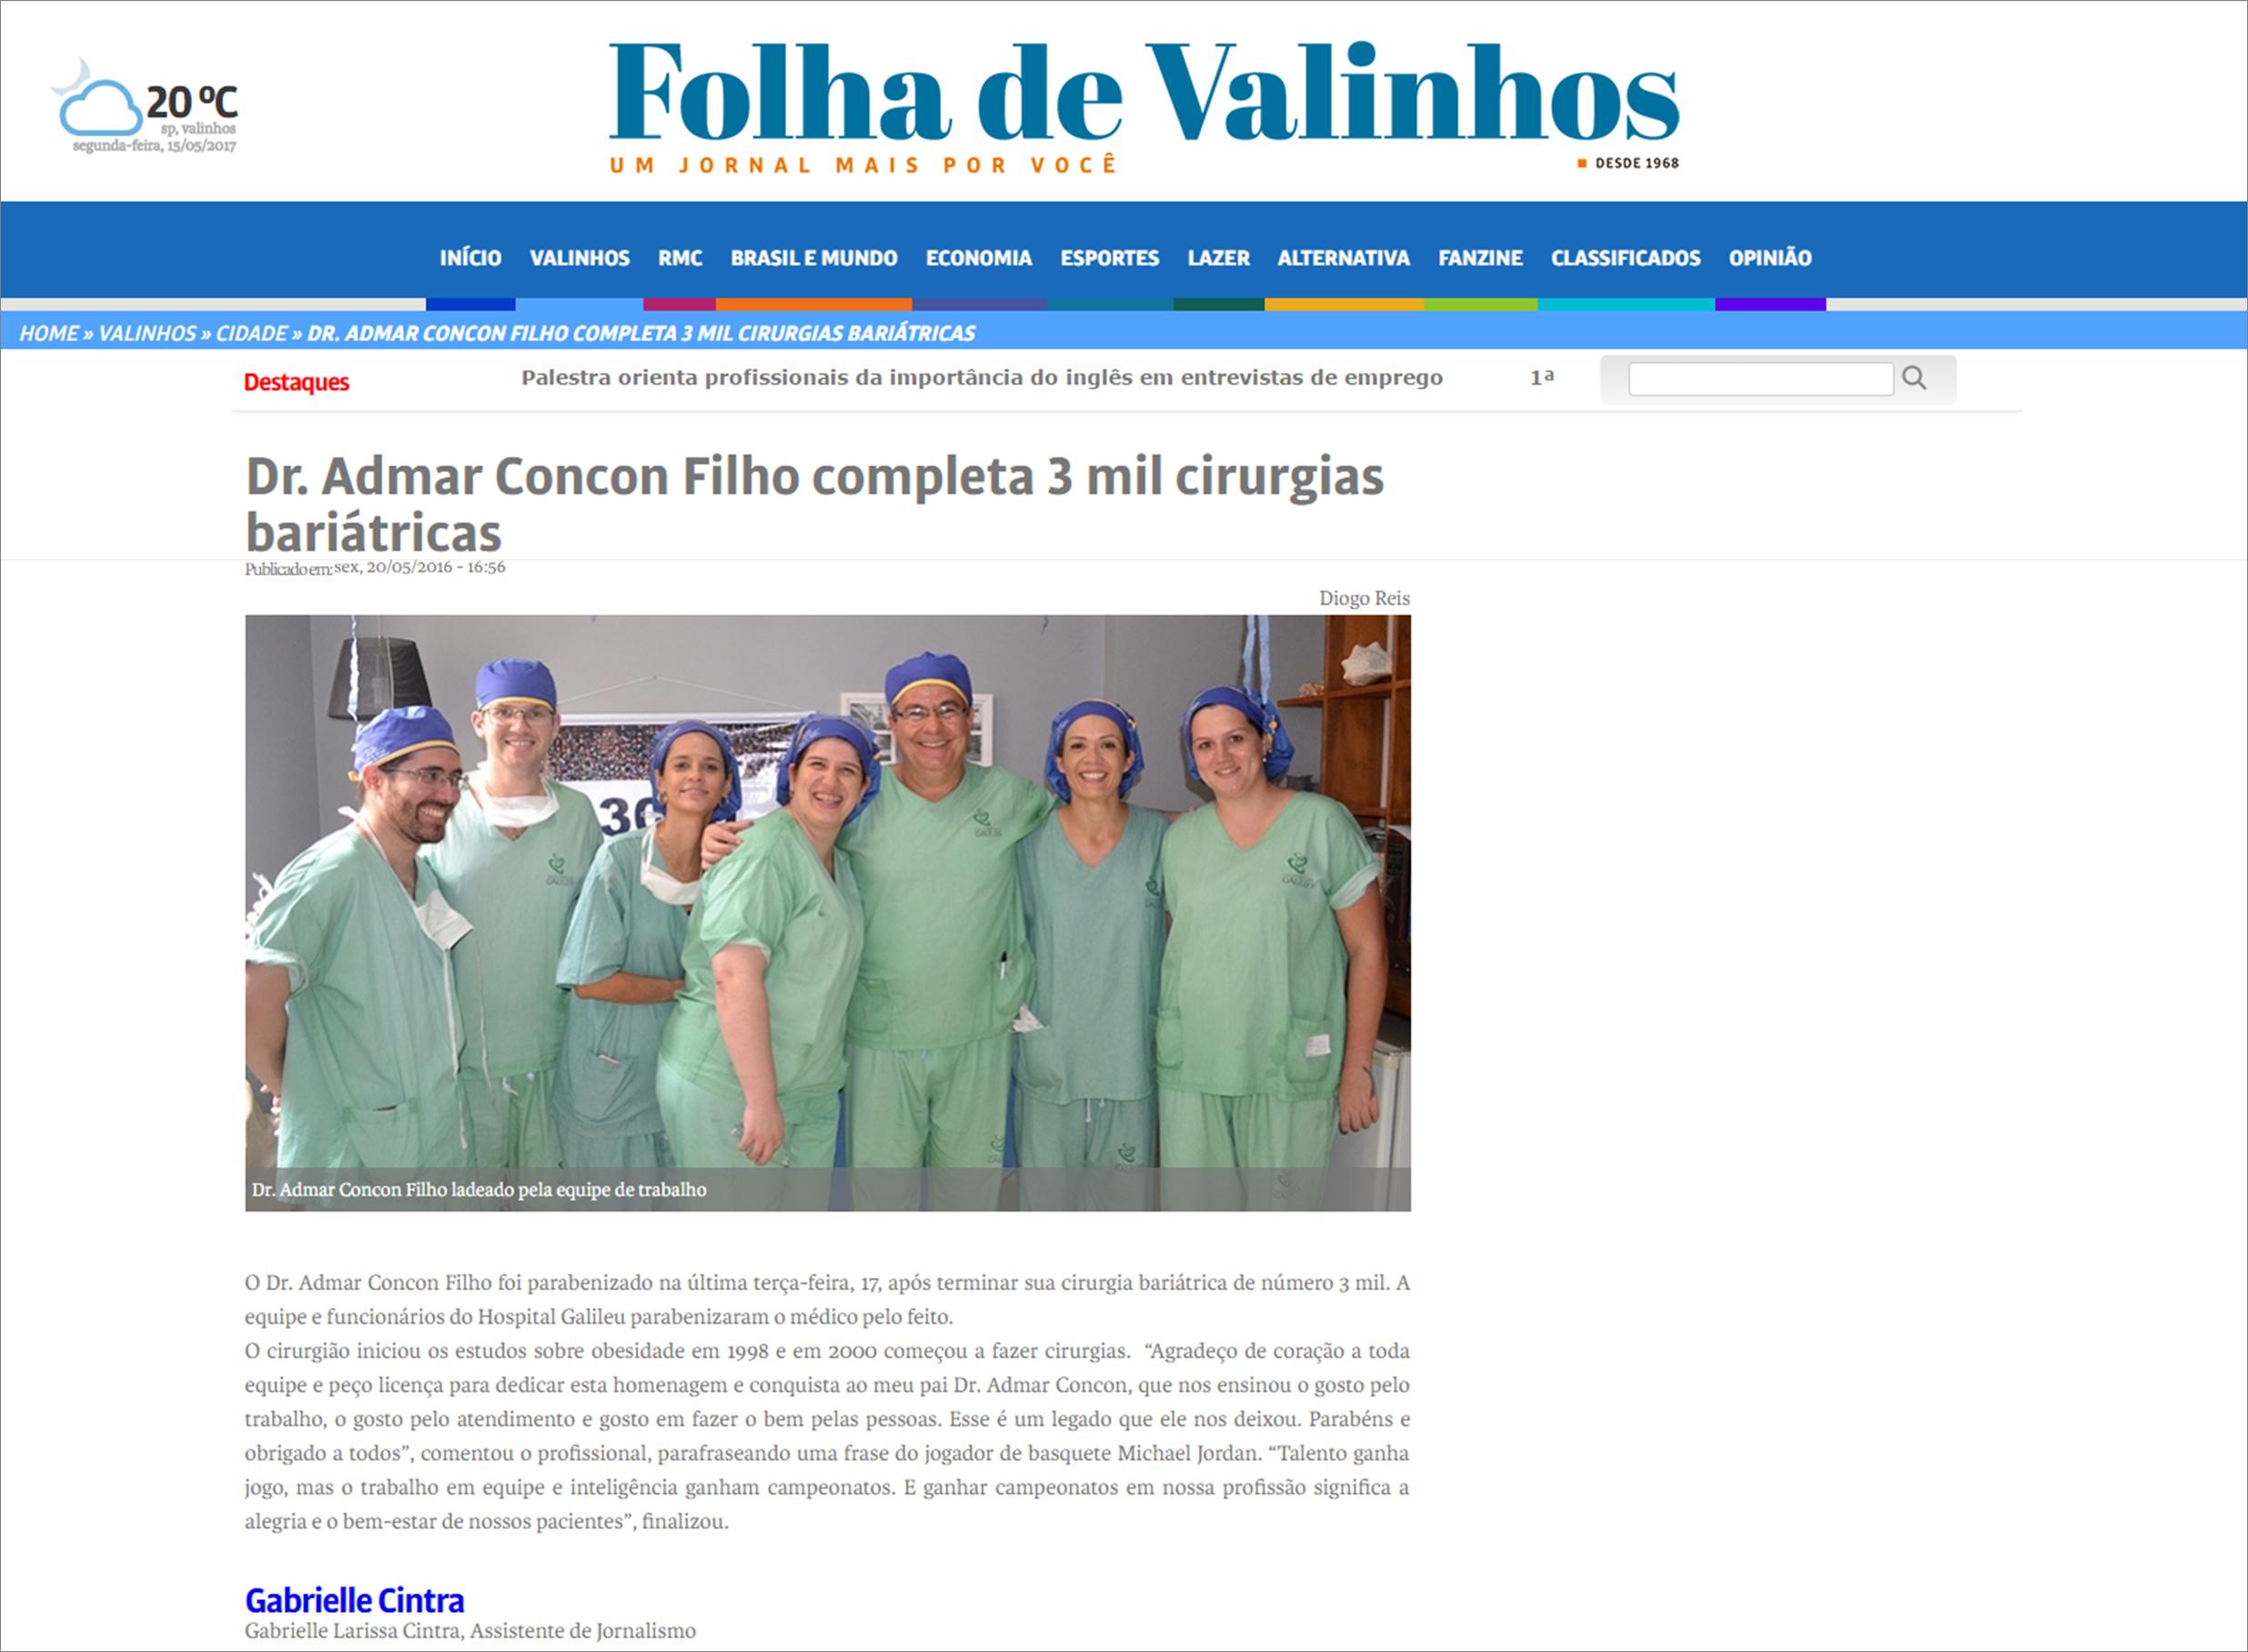 Dr. Admar Concon Filho completa 3 mil cirurgias bariátricas